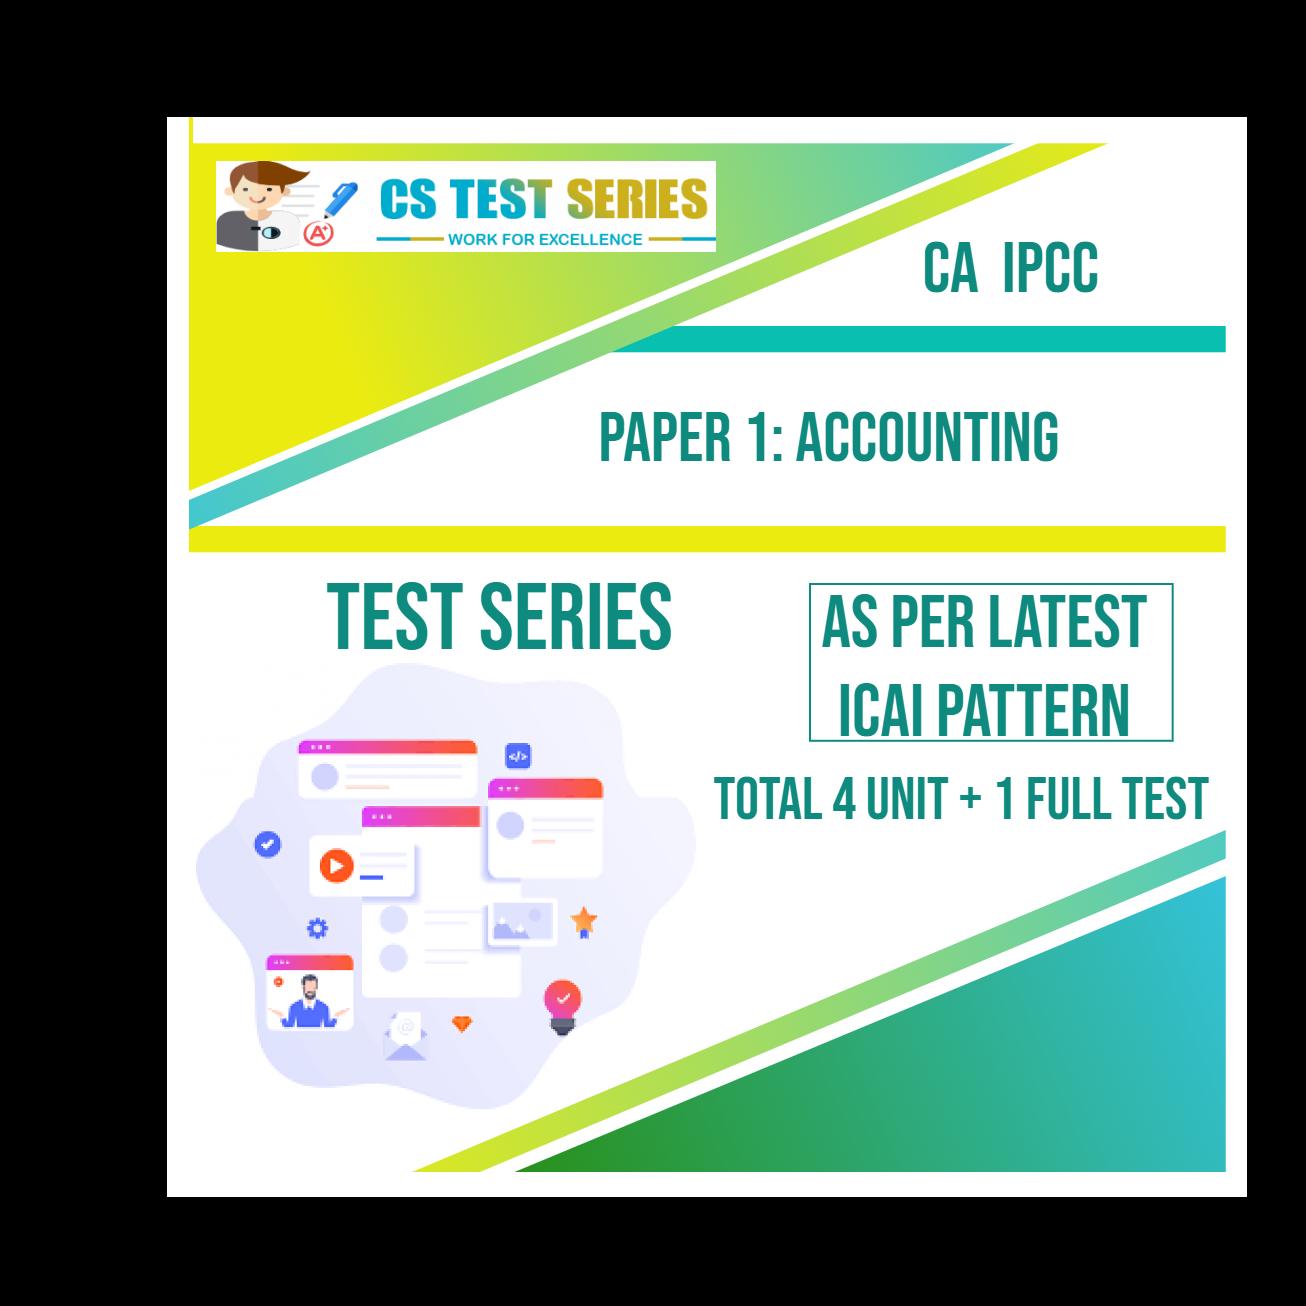 CA IPCC PAPER 1: Accounting